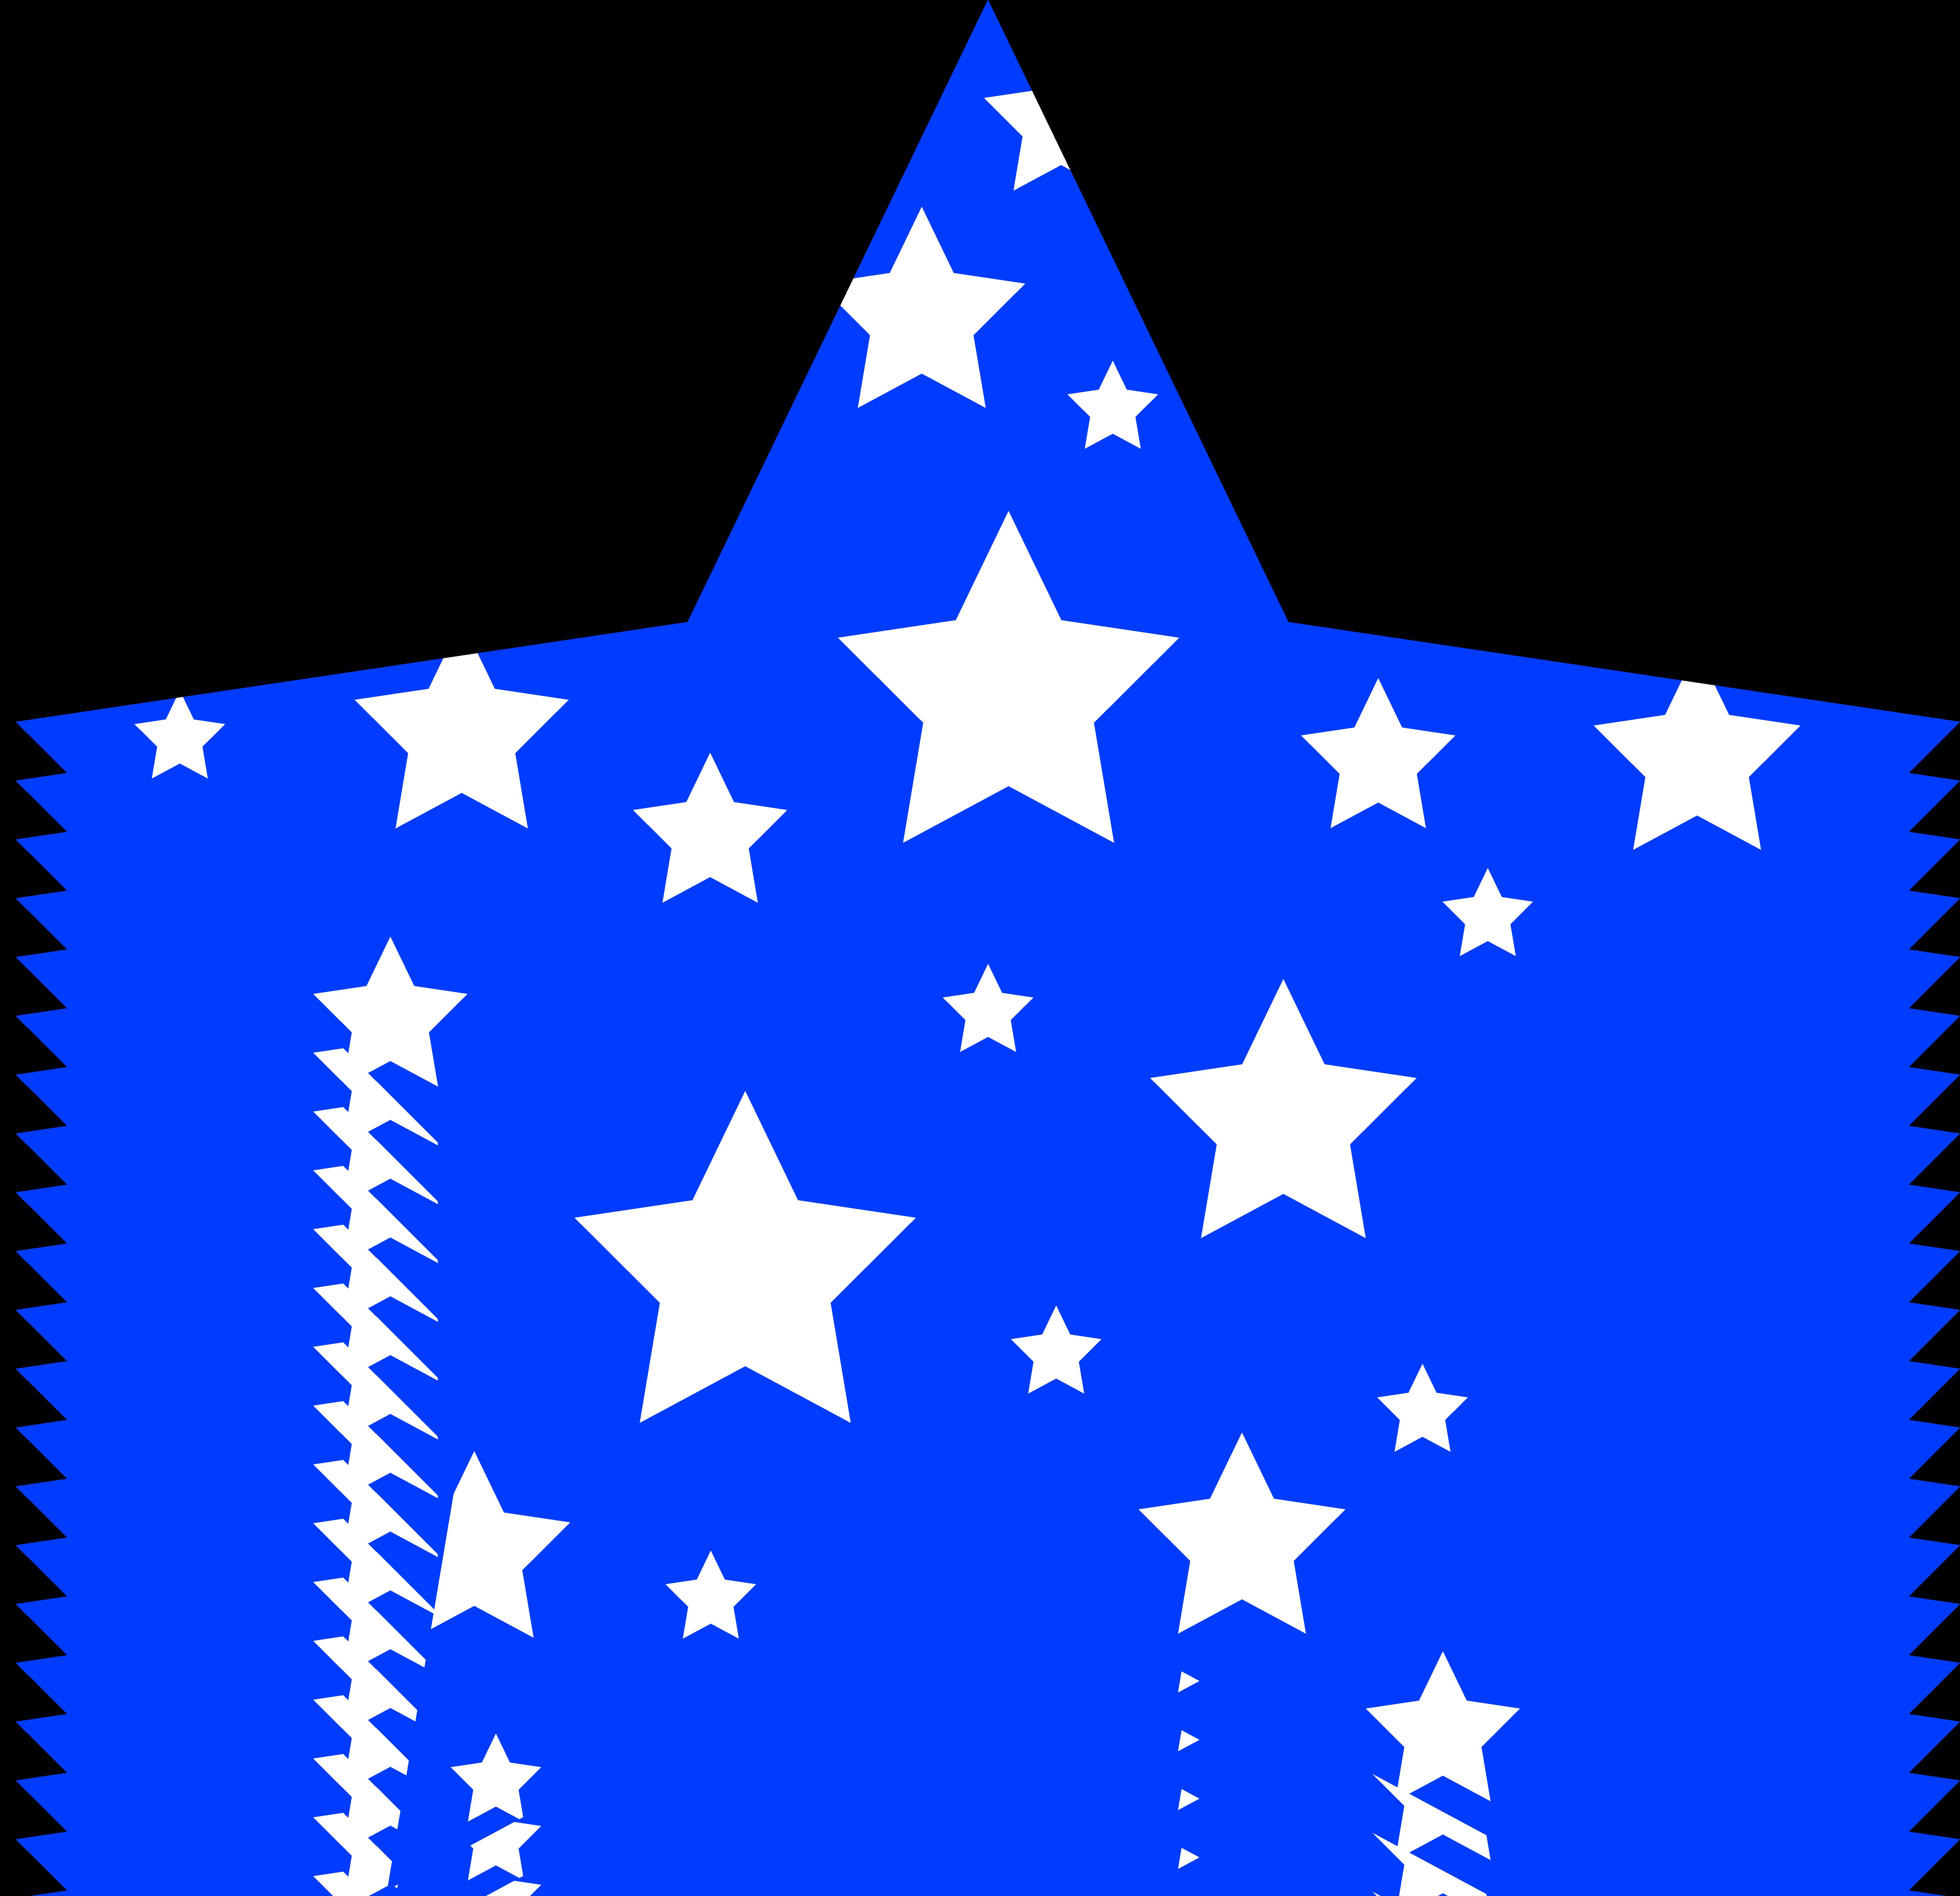 Shooting Star clipart kindergarten Images Clipart Panda white%20stars%20clipart Free